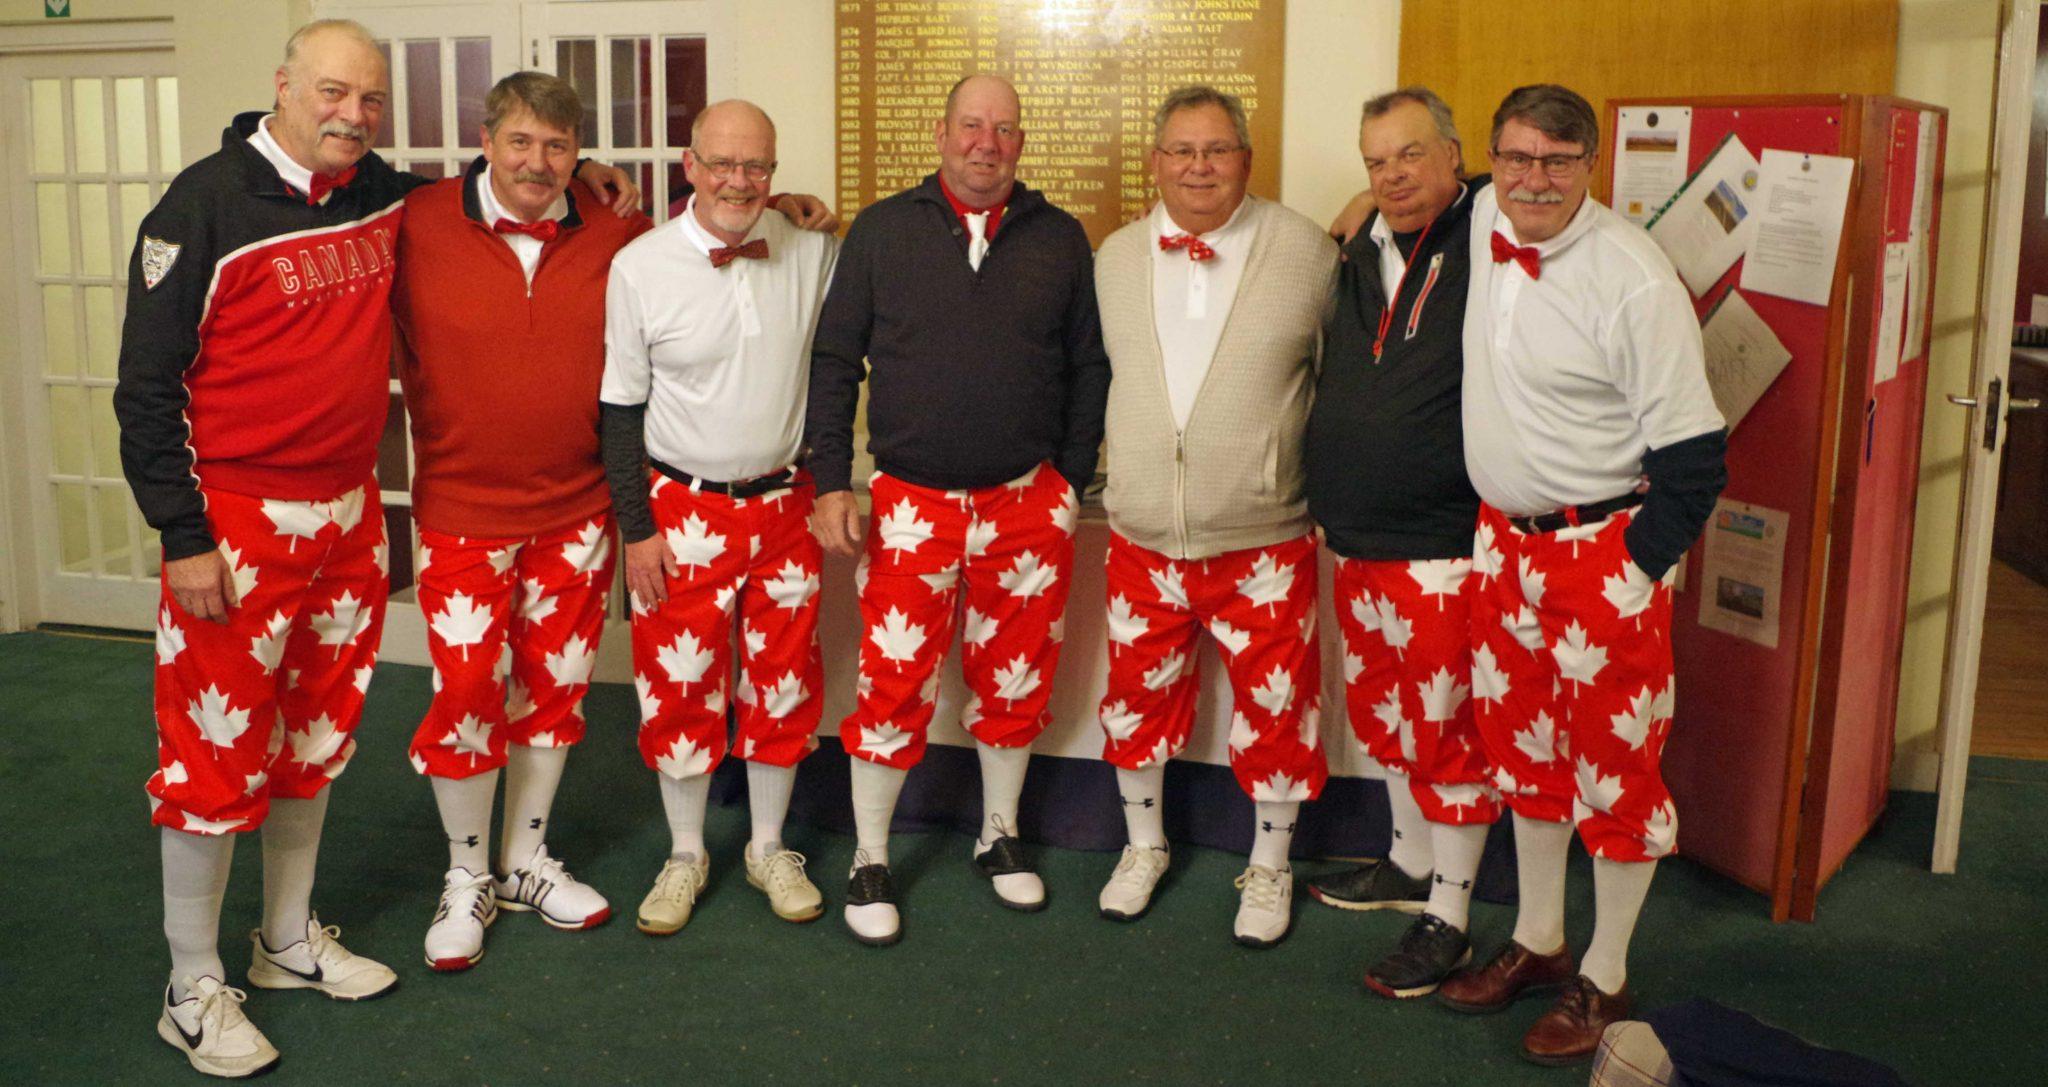 The Crazy Canucks at Dunbar Golf Club